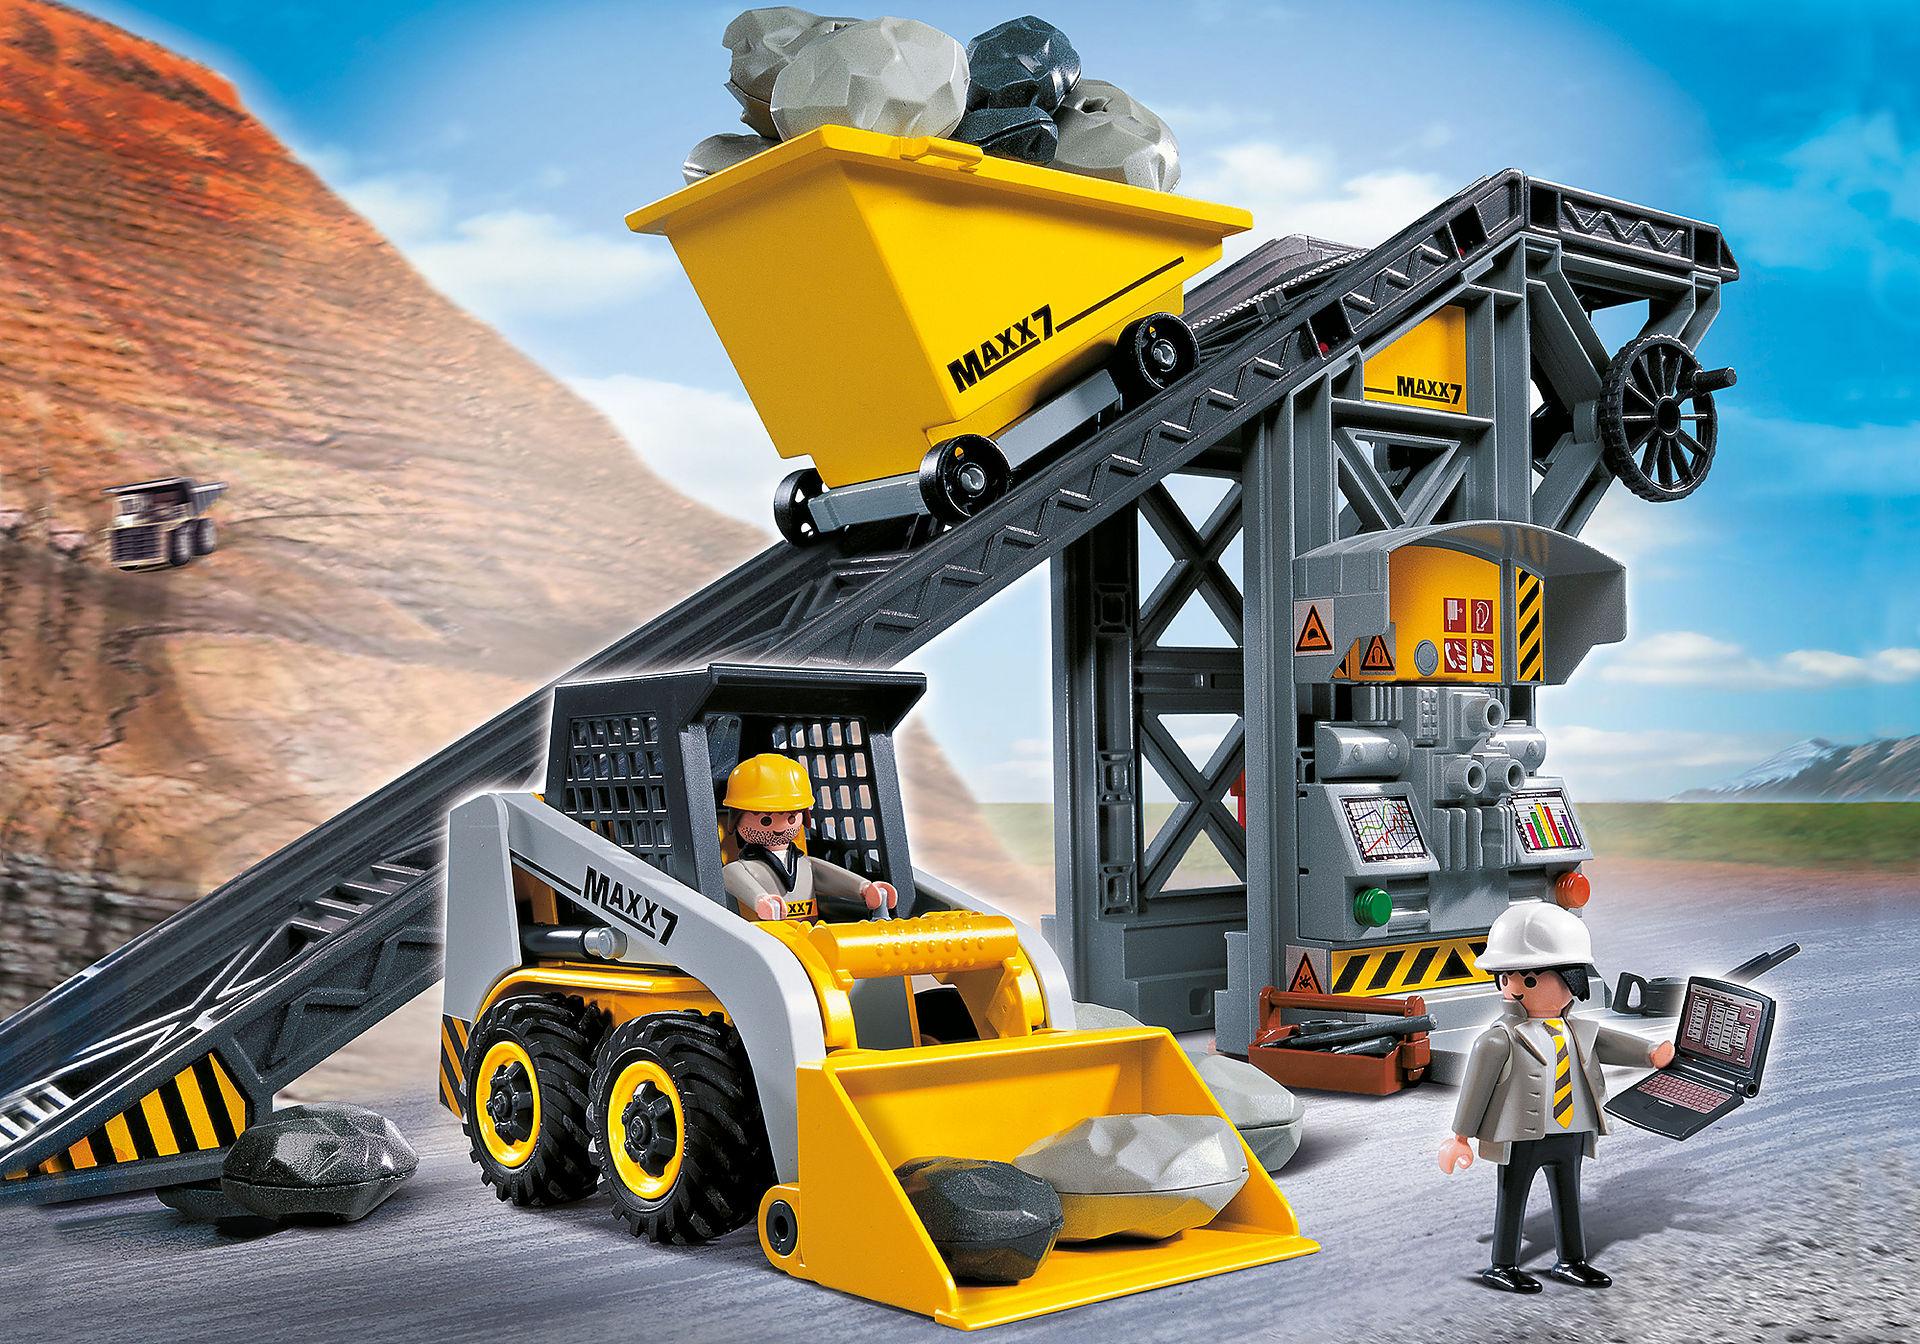 4041 Conveyor Belt with Mini Excavator zoom image1